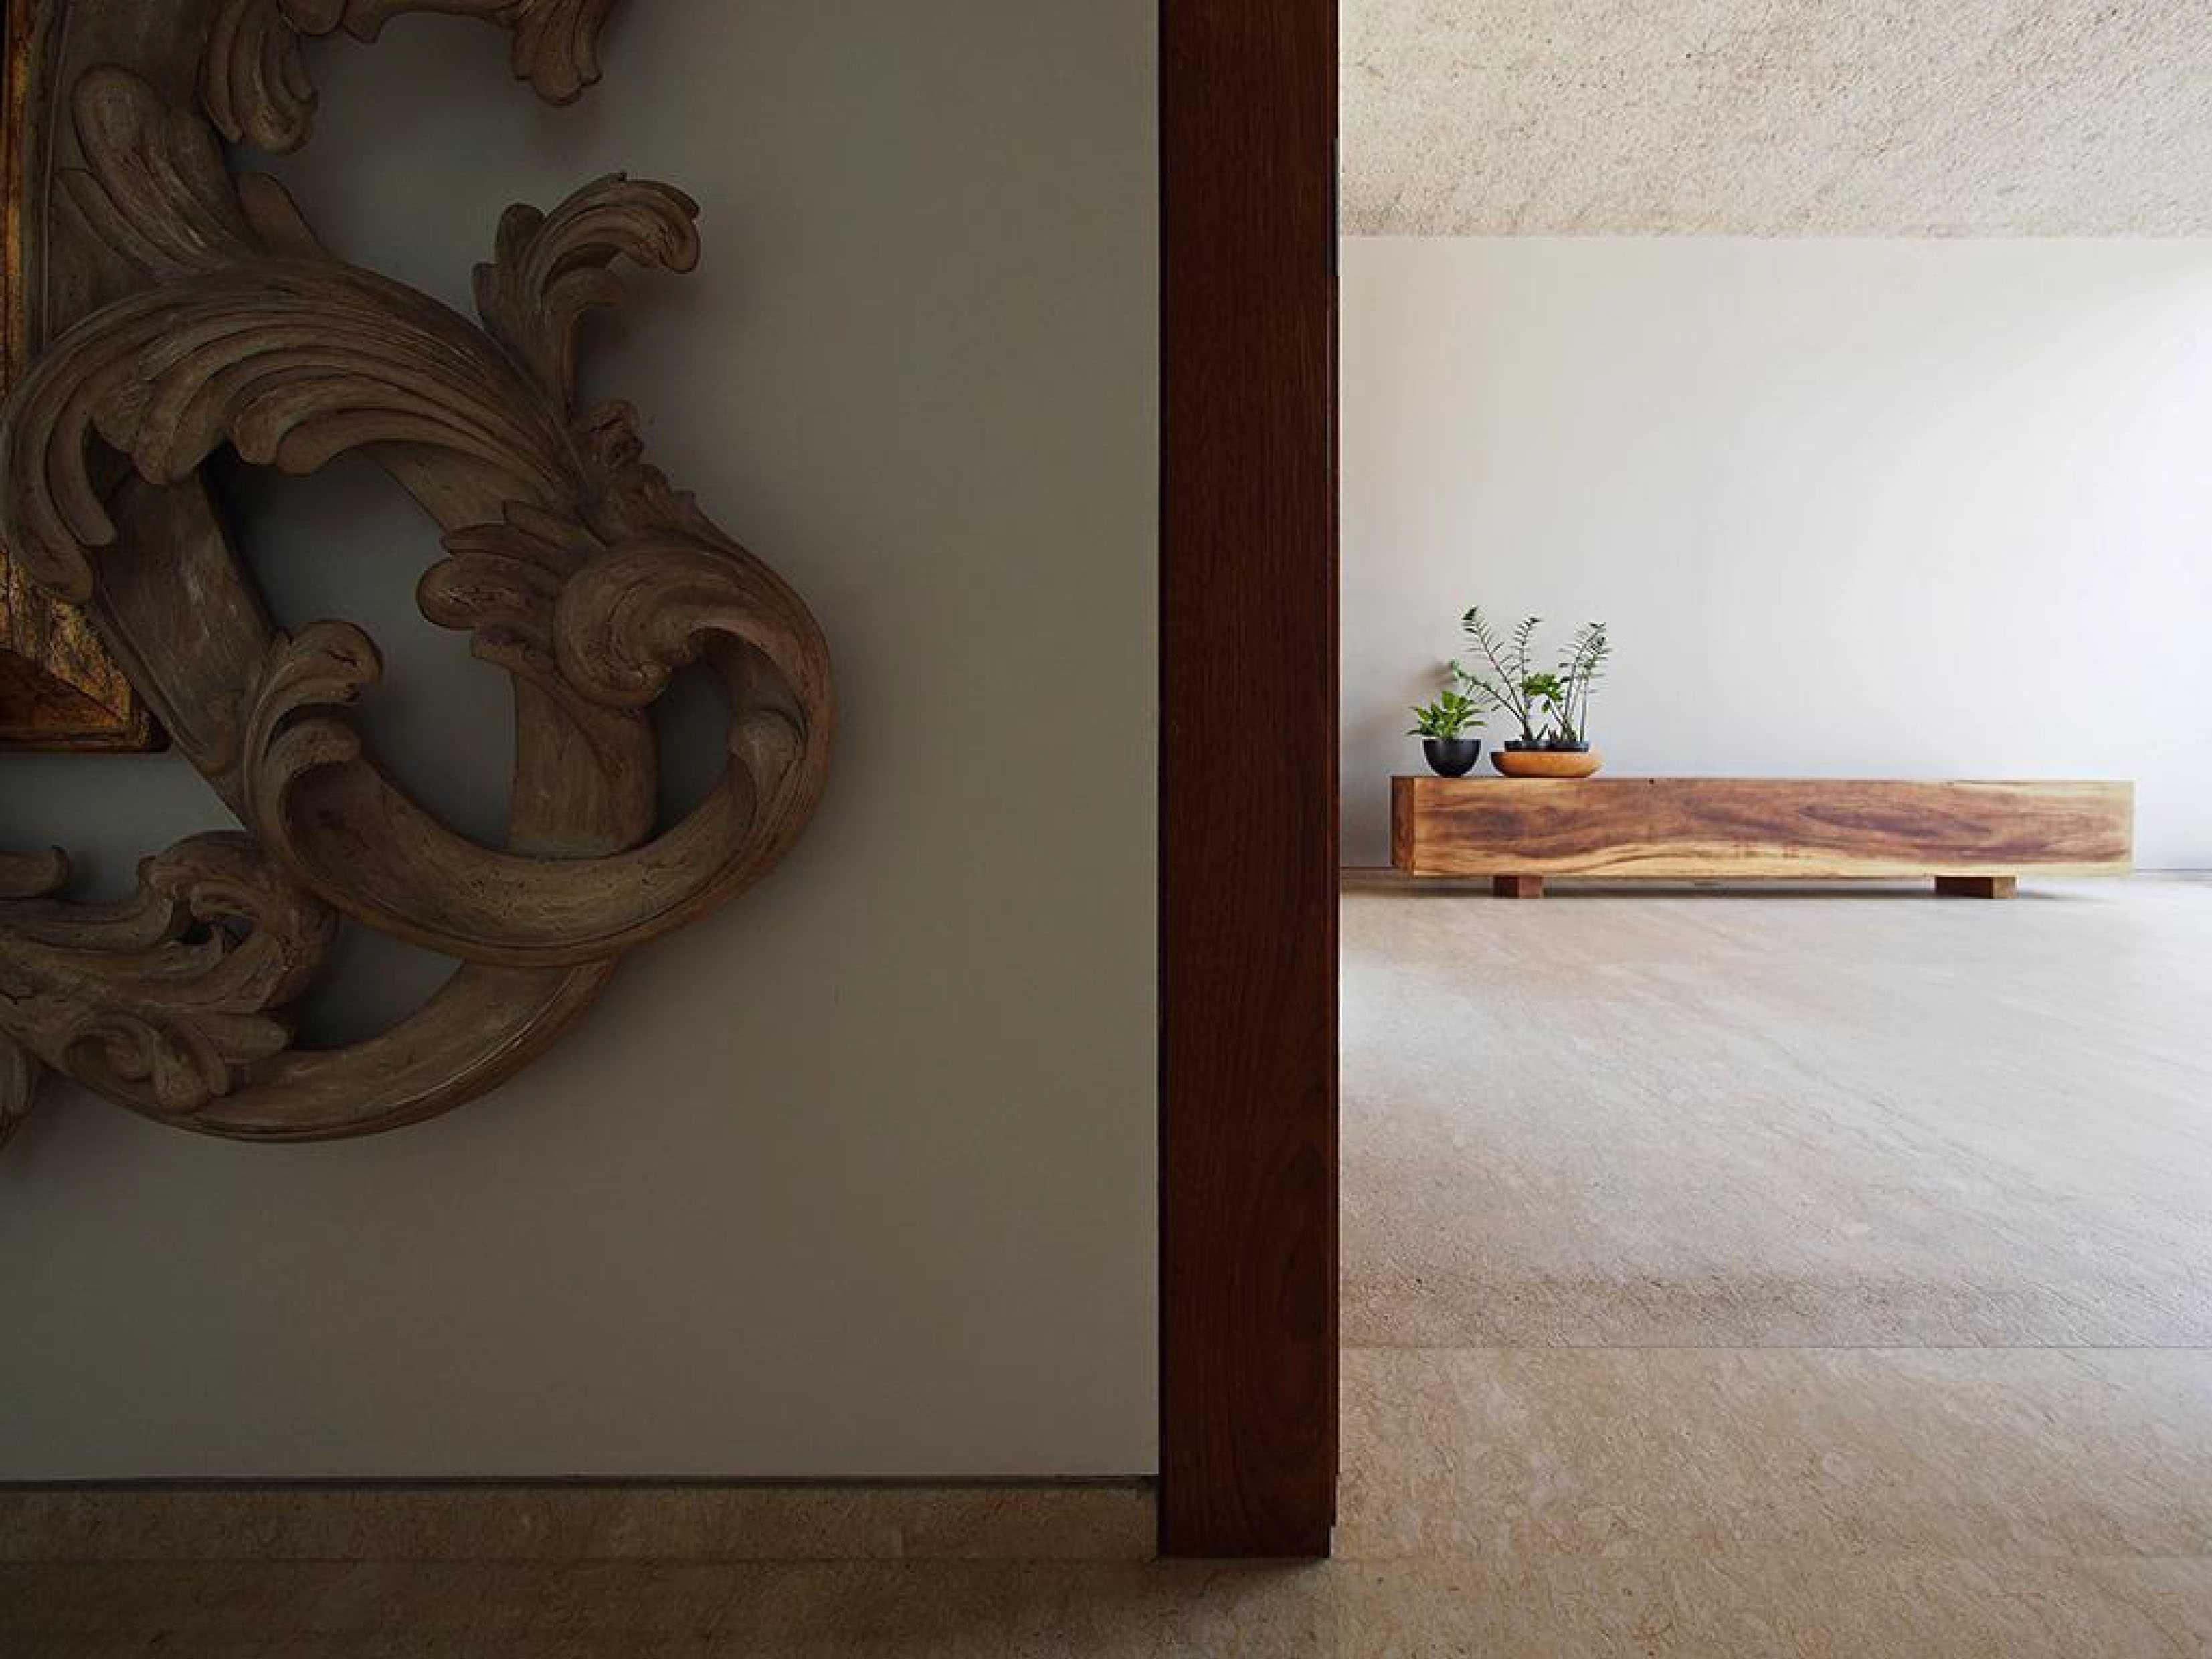 Studio Air Putih P_House Bsd, Serpong Bsd, Serpong Interior Details   25060